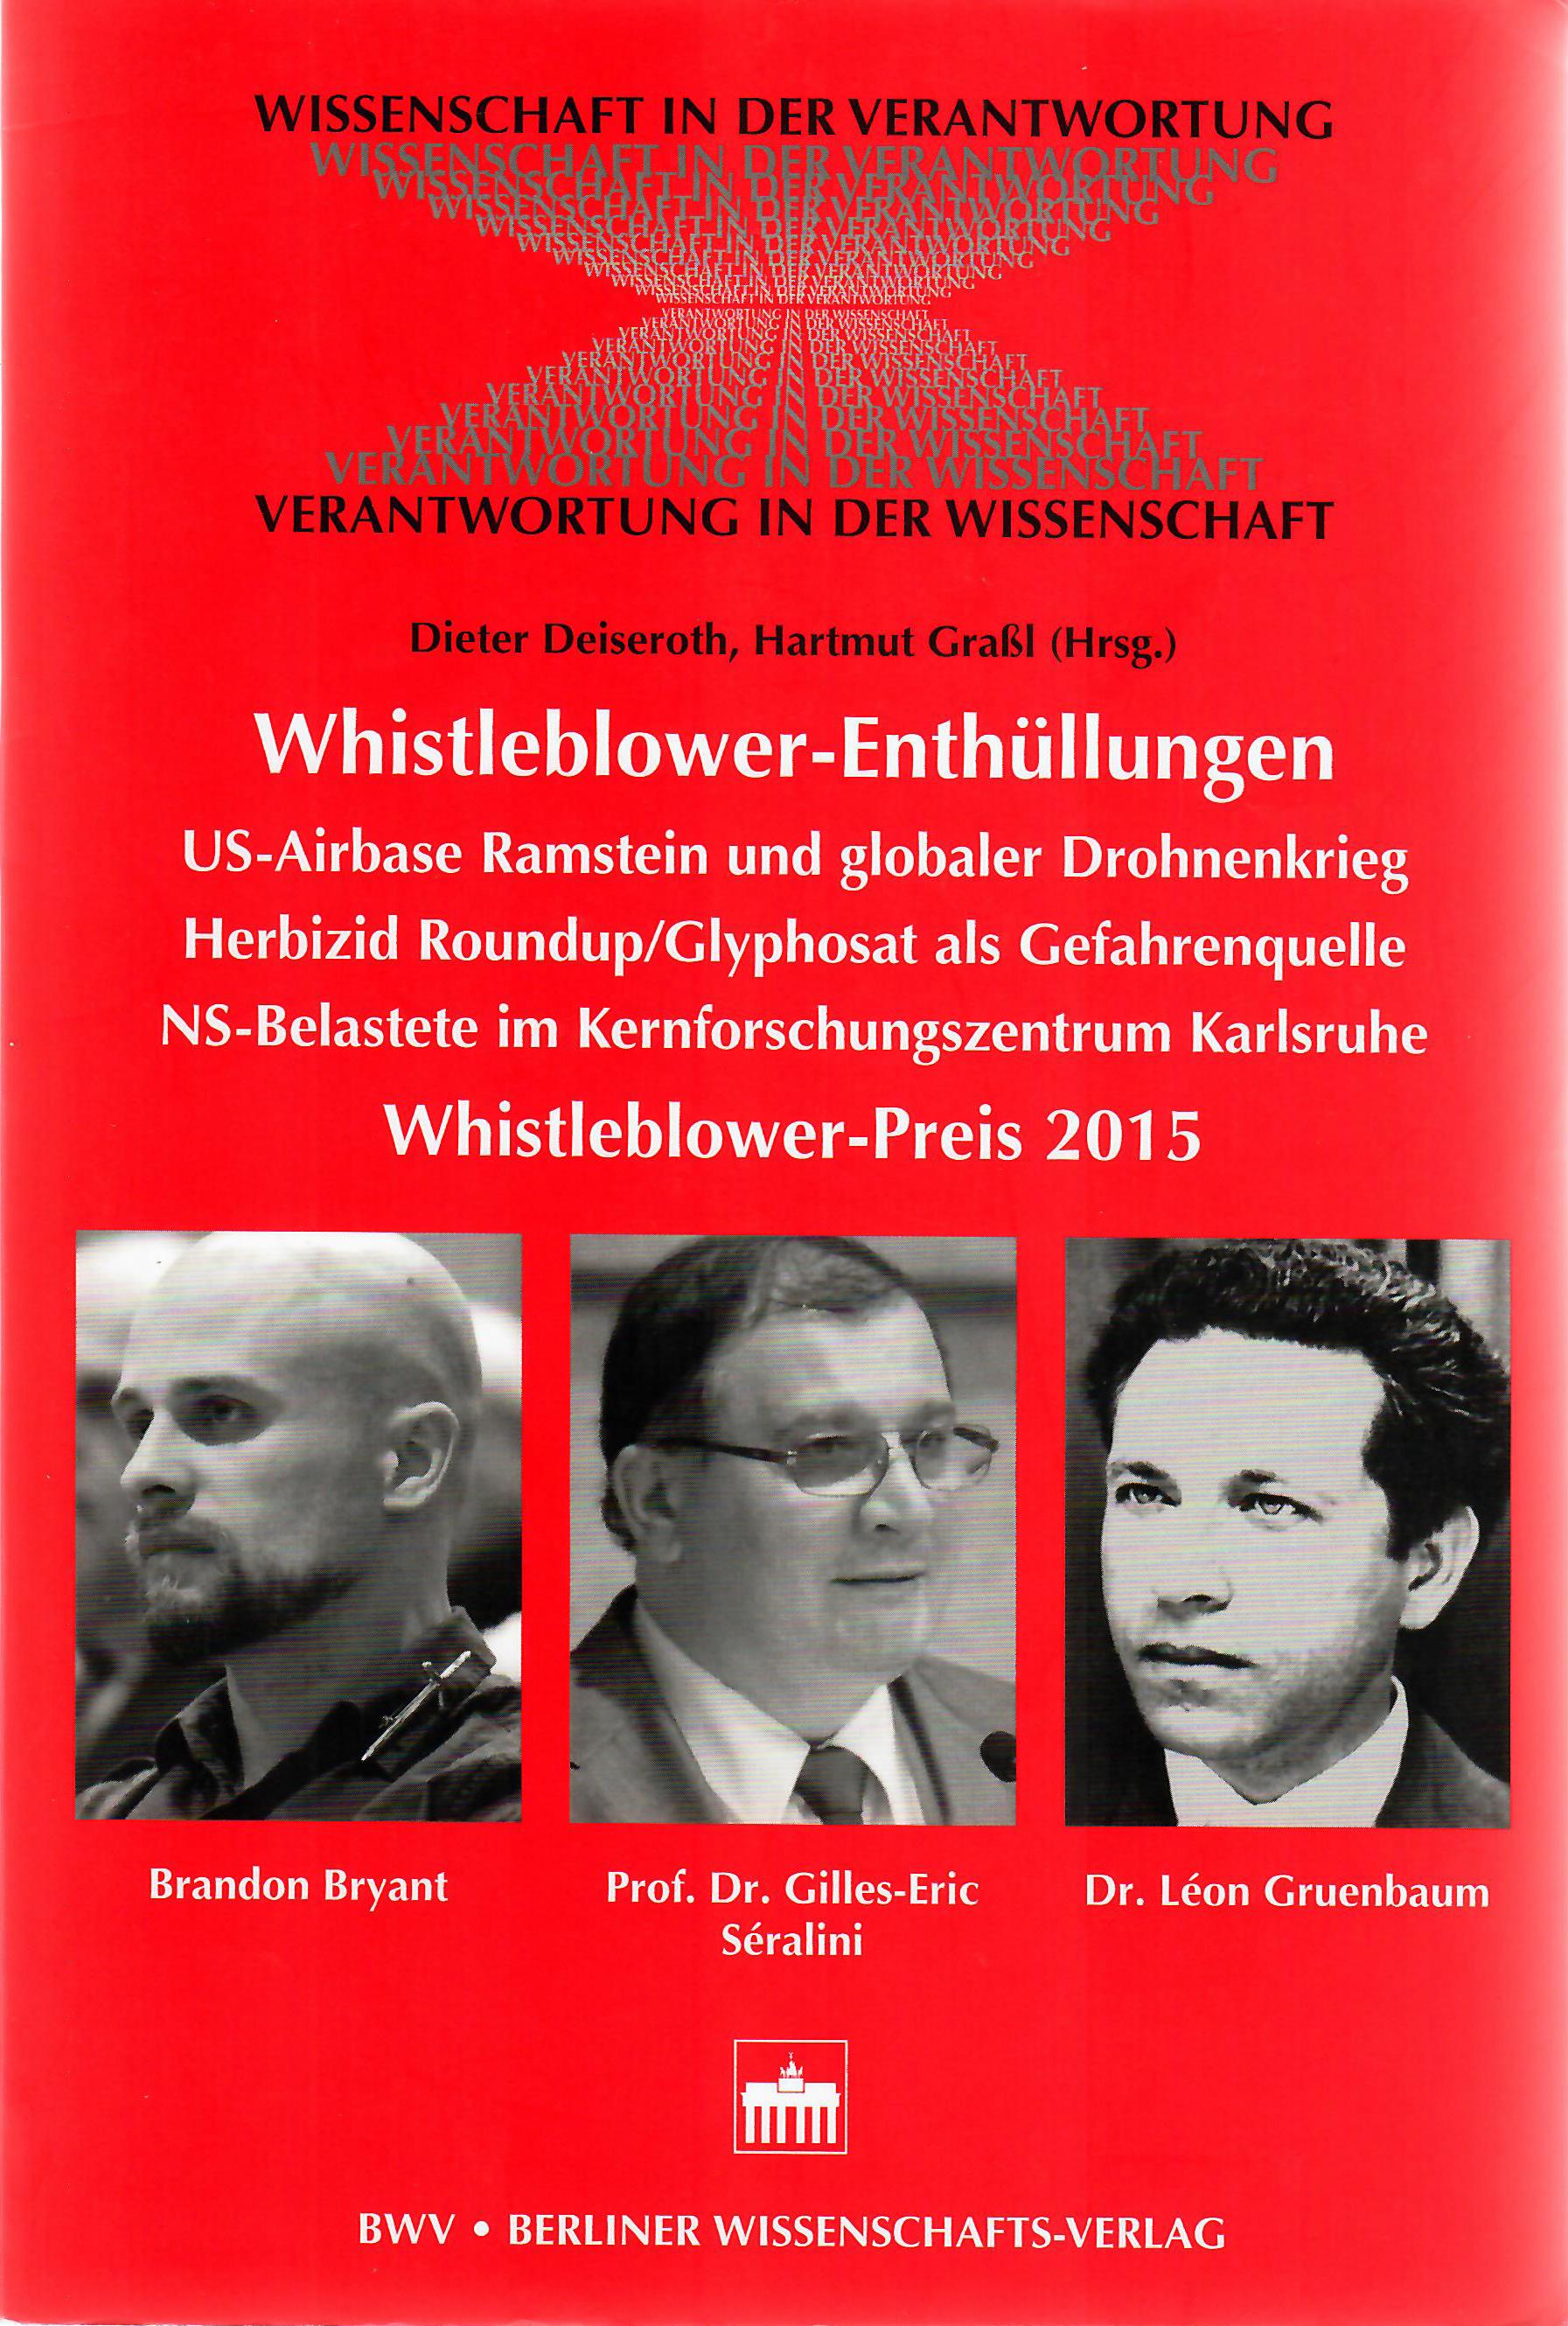 Whistleblower Preis 2015 Buchcover